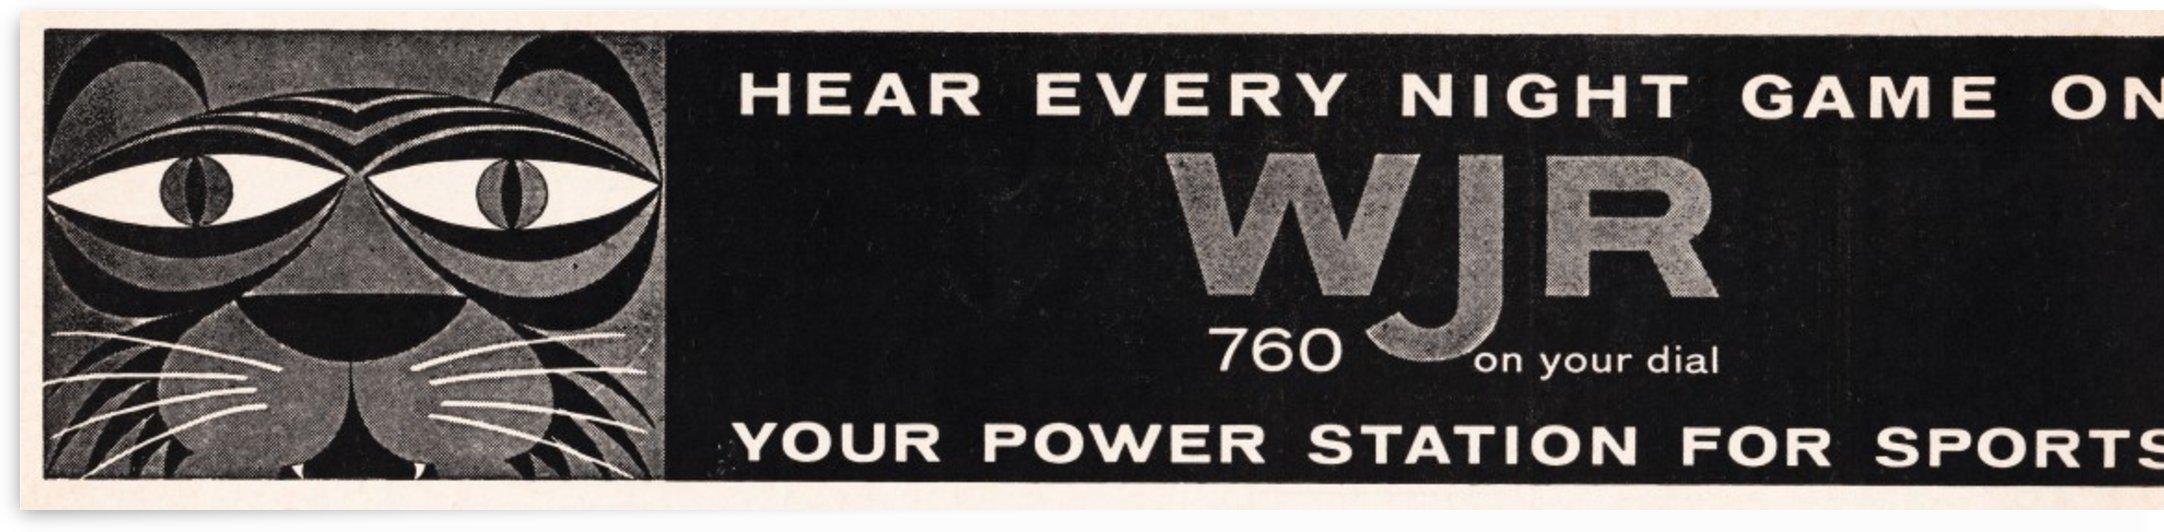 wjr am 760 detroit radio by Row One Brand